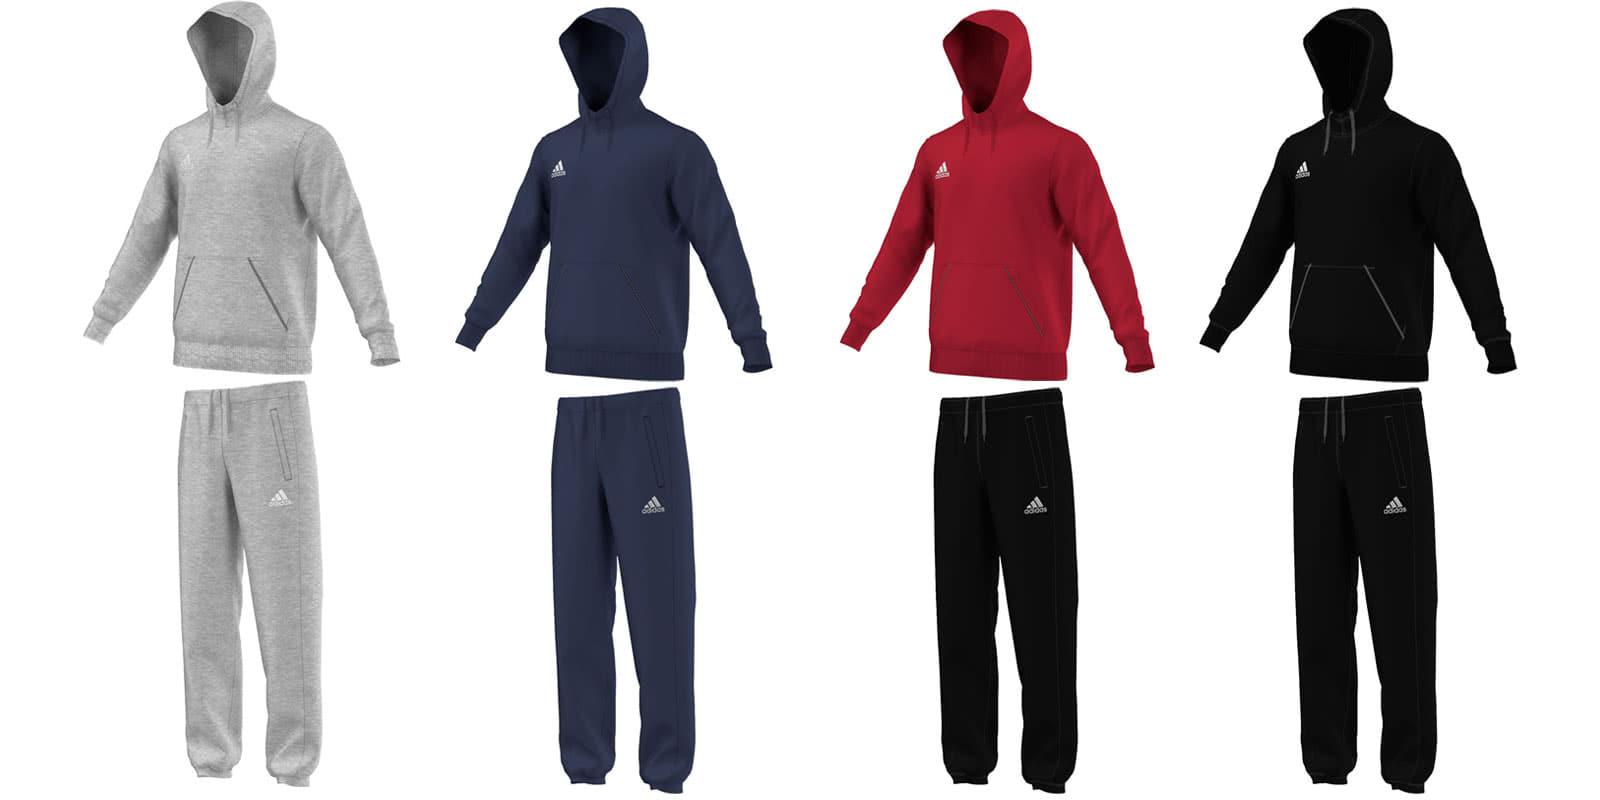 adidas kapuzenanzug jogginganzug core 15 sportartikel und fussballschuhe news. Black Bedroom Furniture Sets. Home Design Ideas